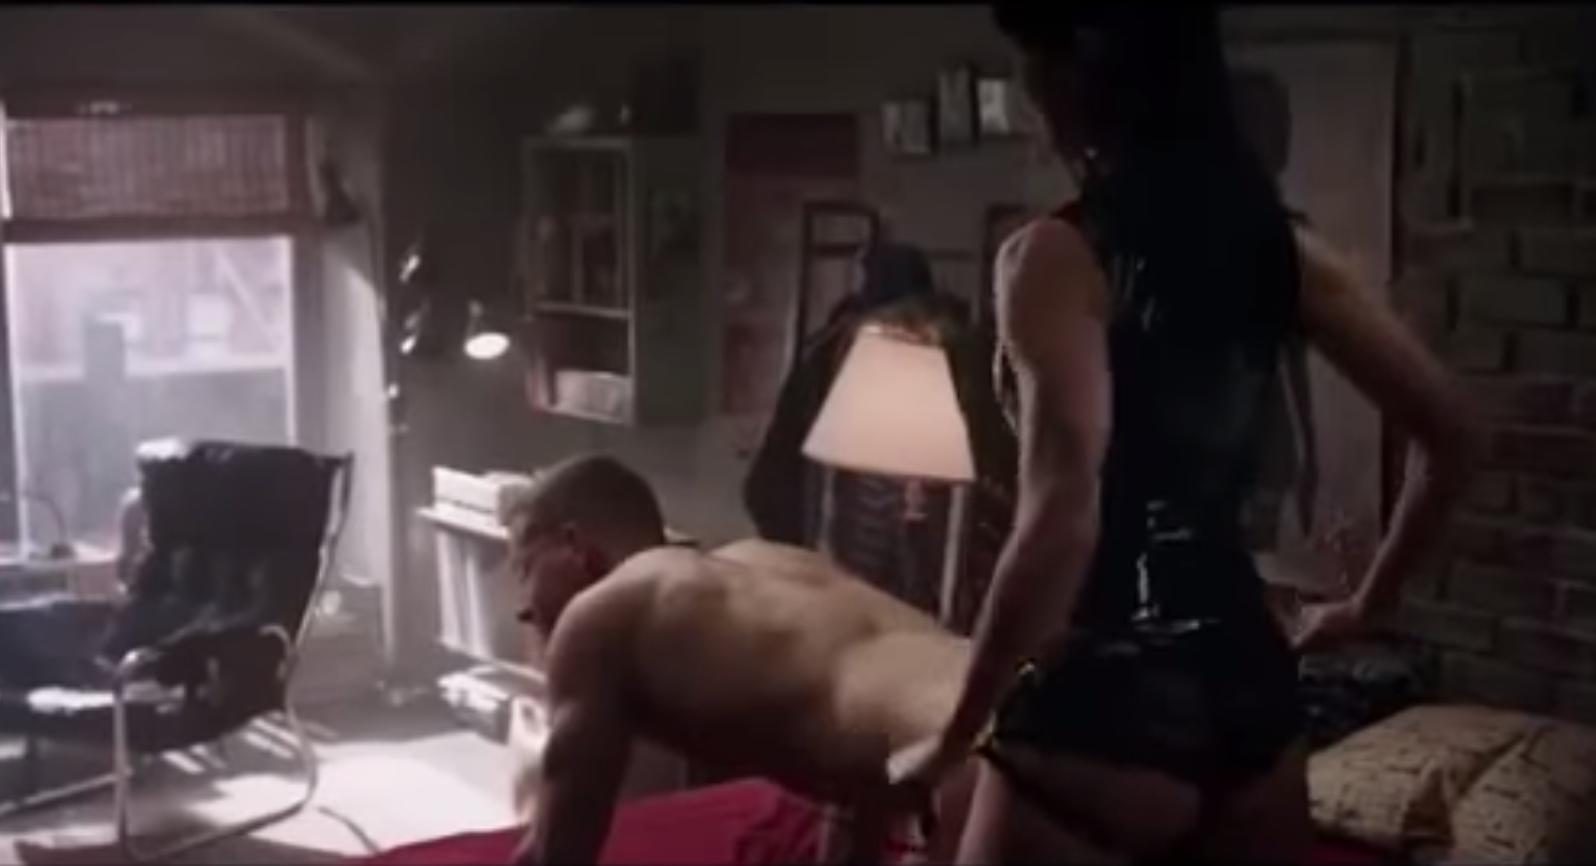 Hot Movie Sex Scenes - Sex Scenes from Movies